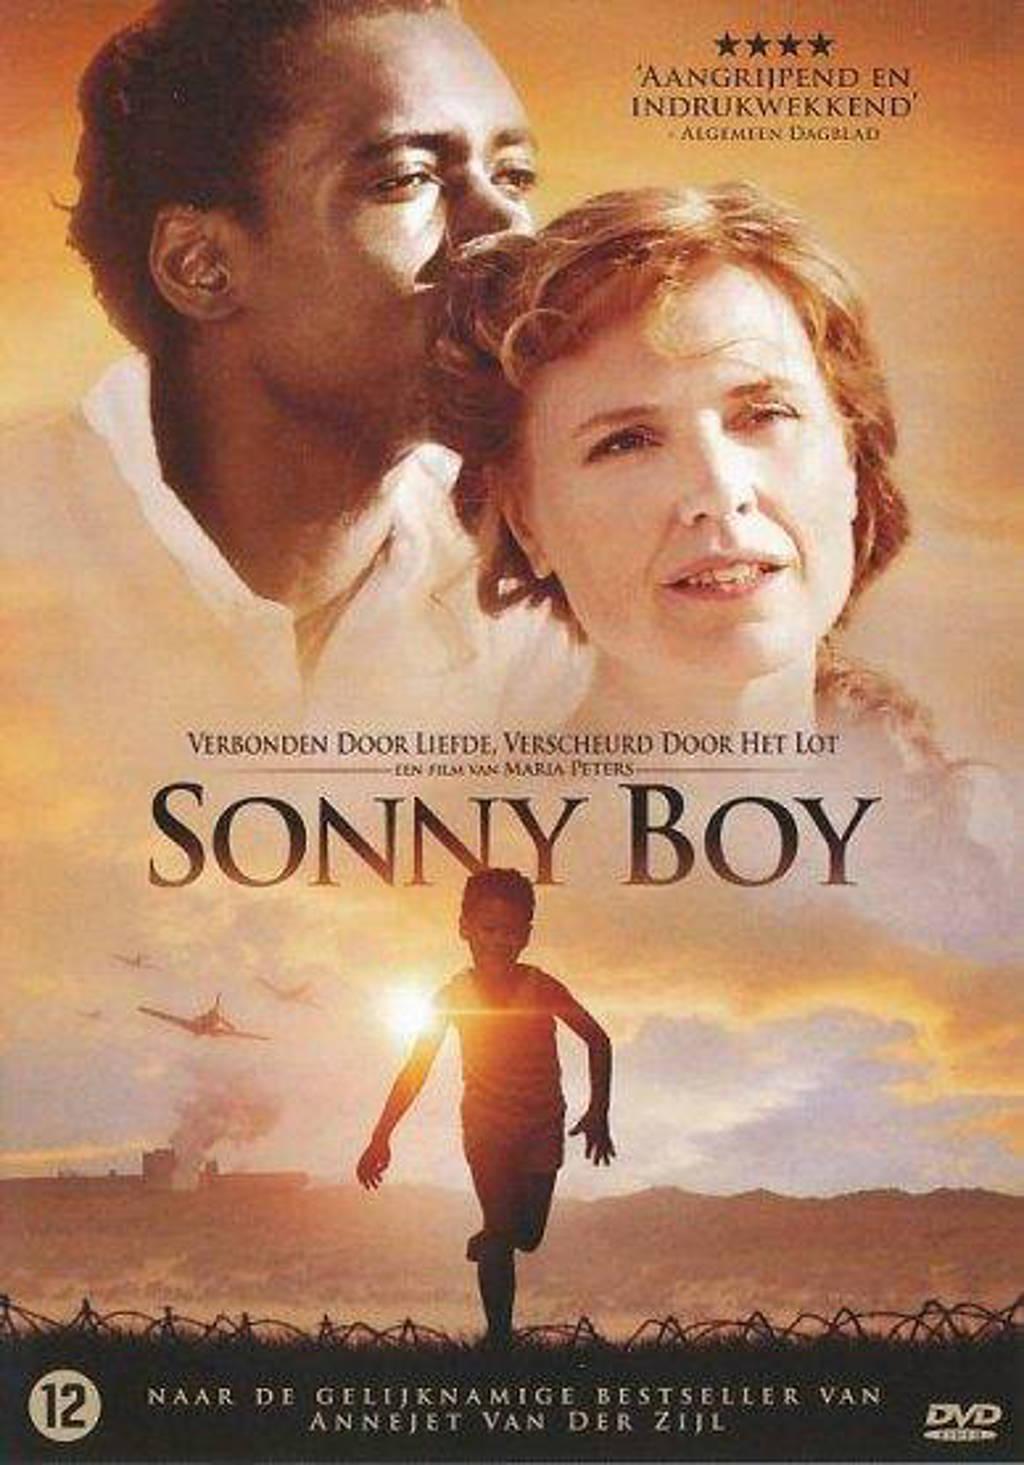 Sonny boy (DVD)